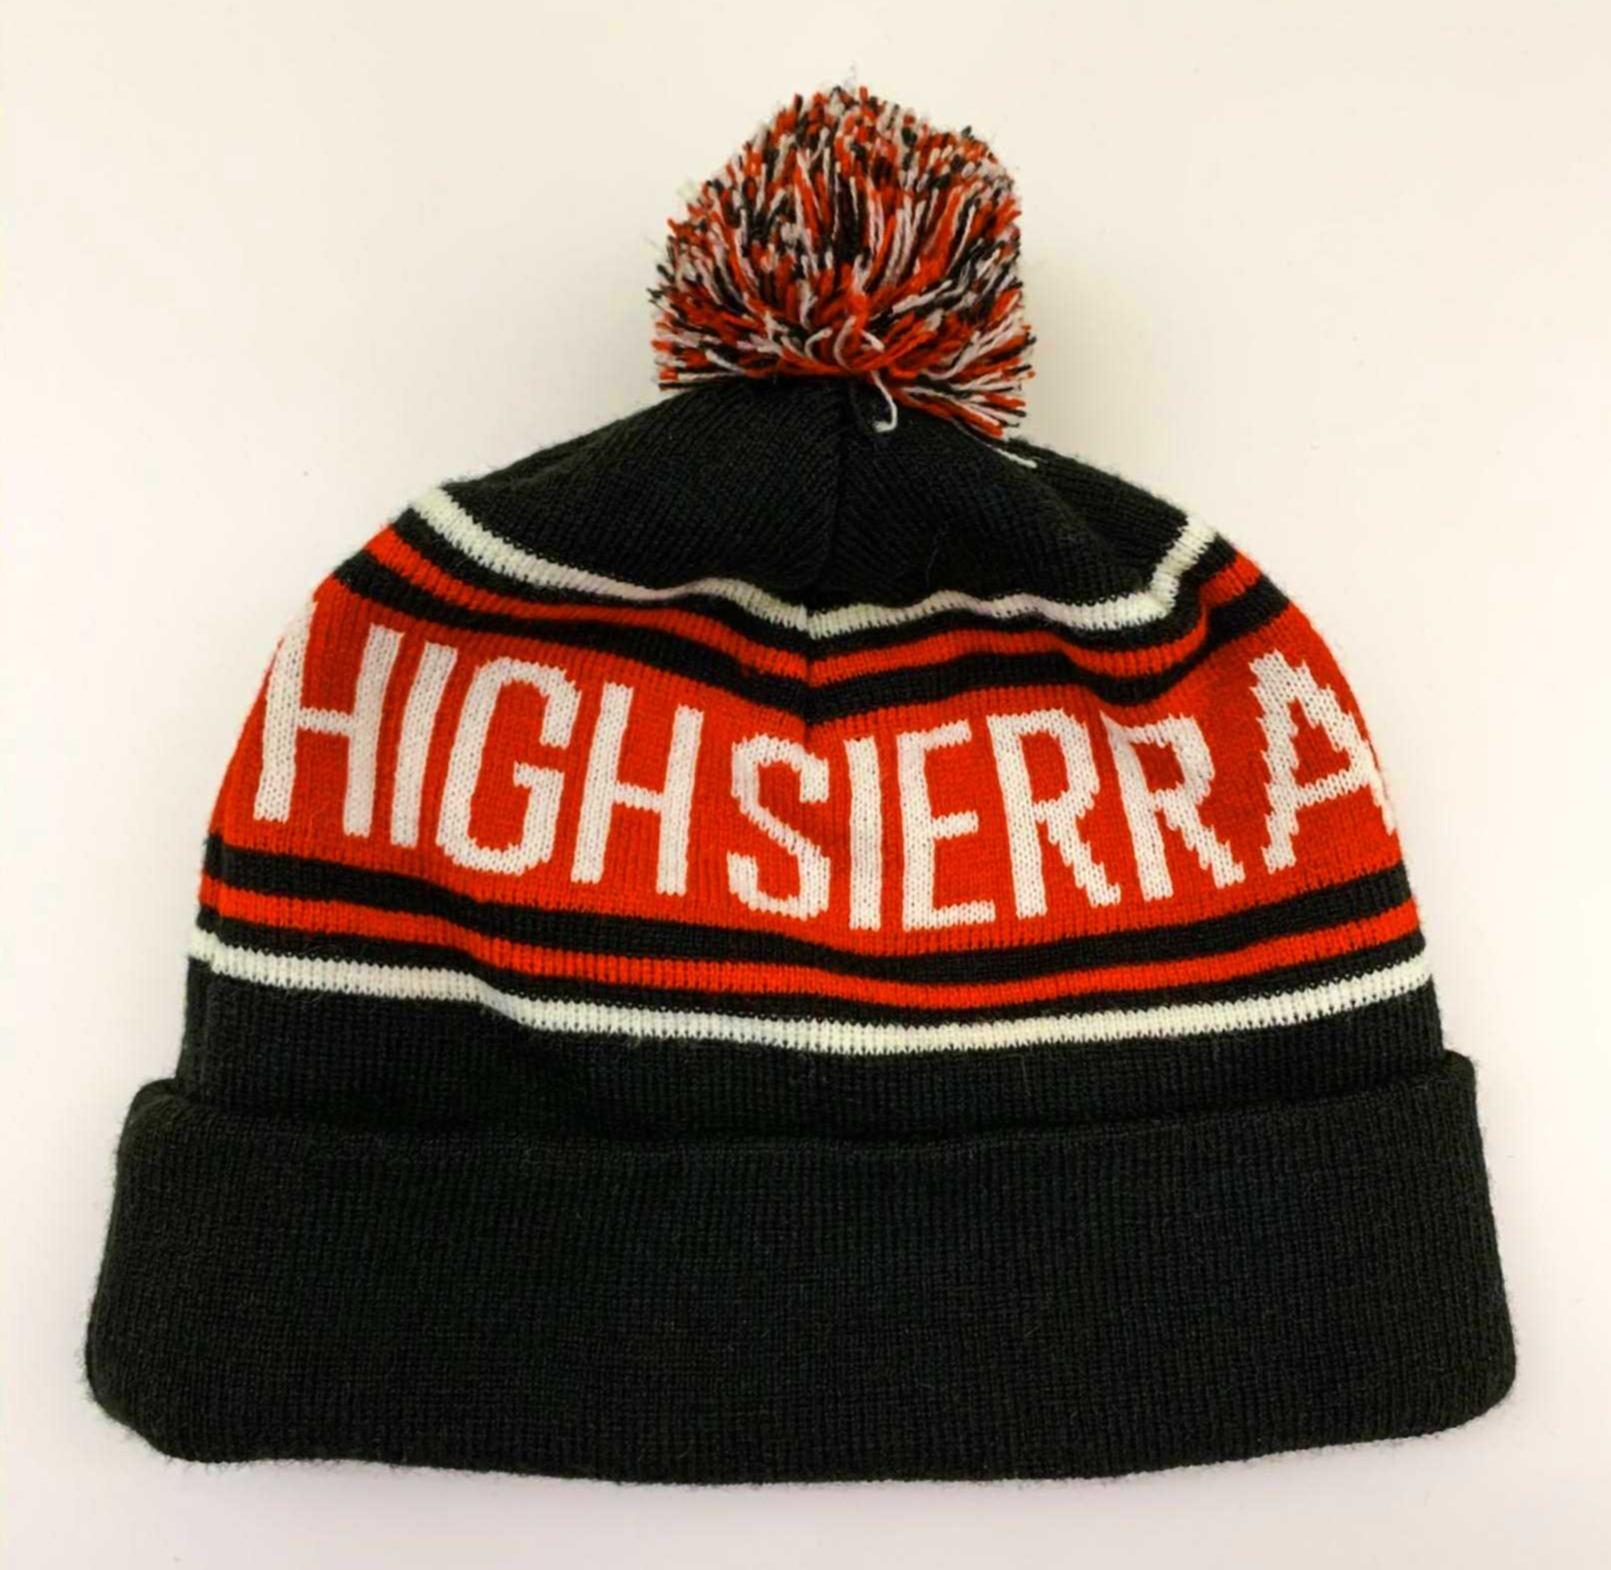 Branded beanie - High Sierra